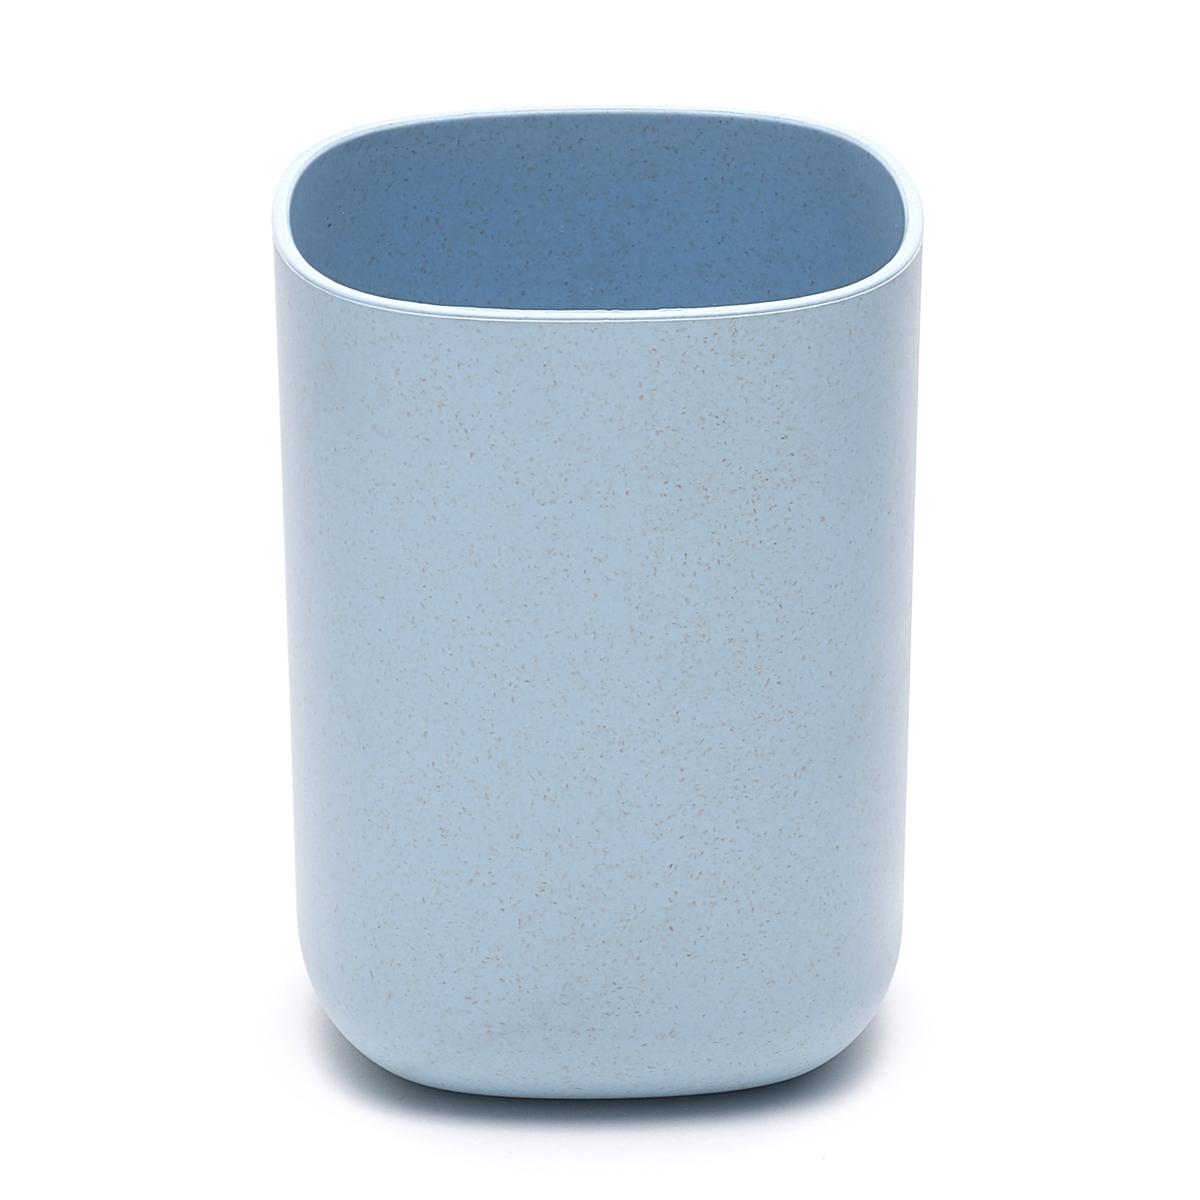 Dóza Swiss Aqua Technologies Azul šířka 7,8 cm modrá melanž AZUL27